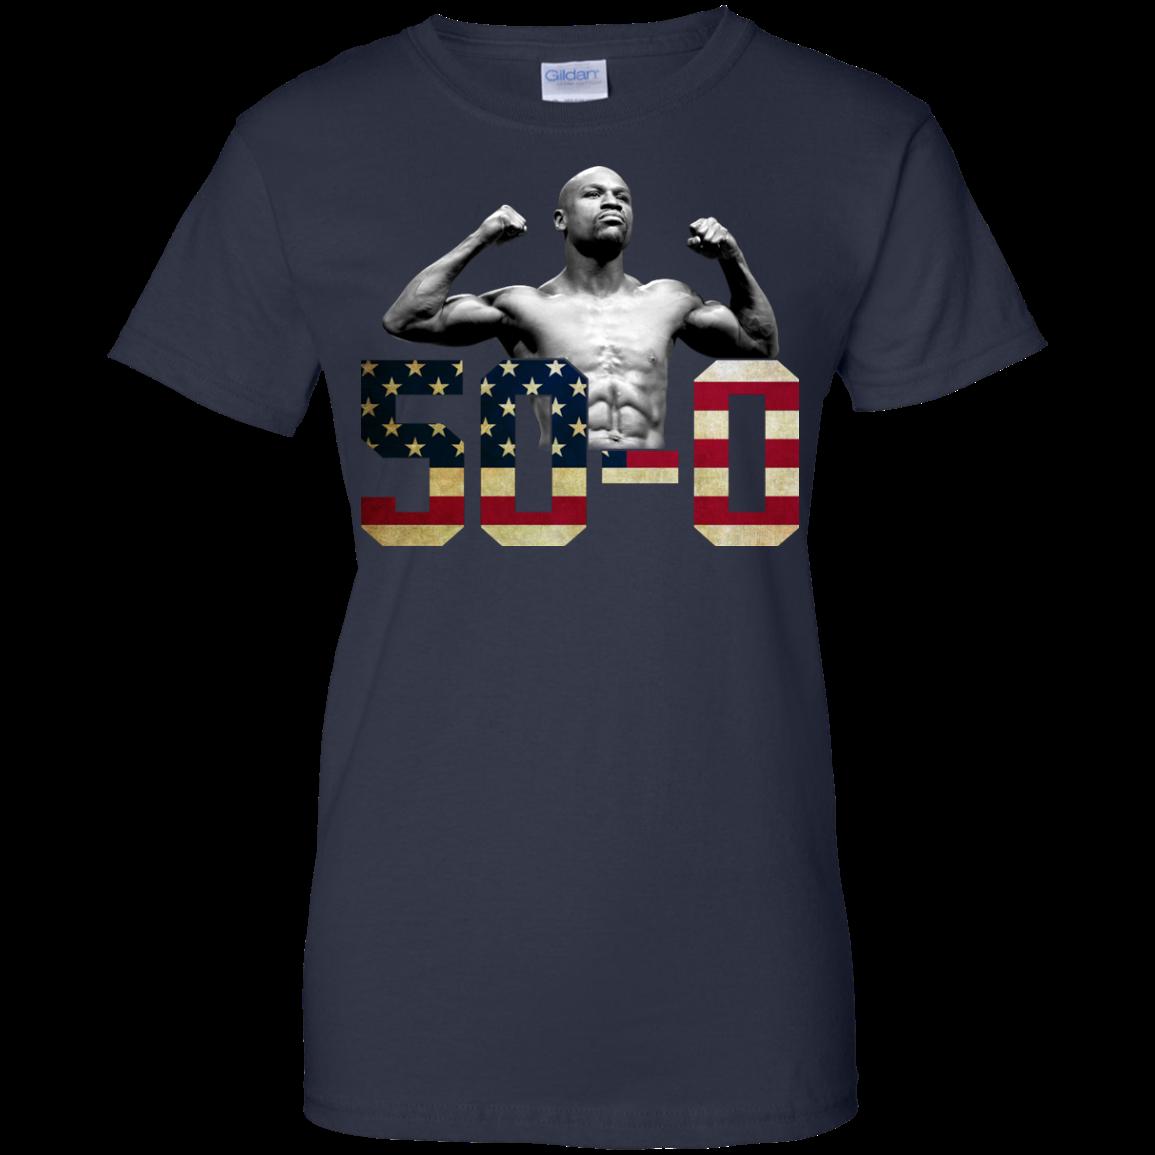 image 513px Floyd Mayweather 50 0 Shirt, Hoodies, Tank